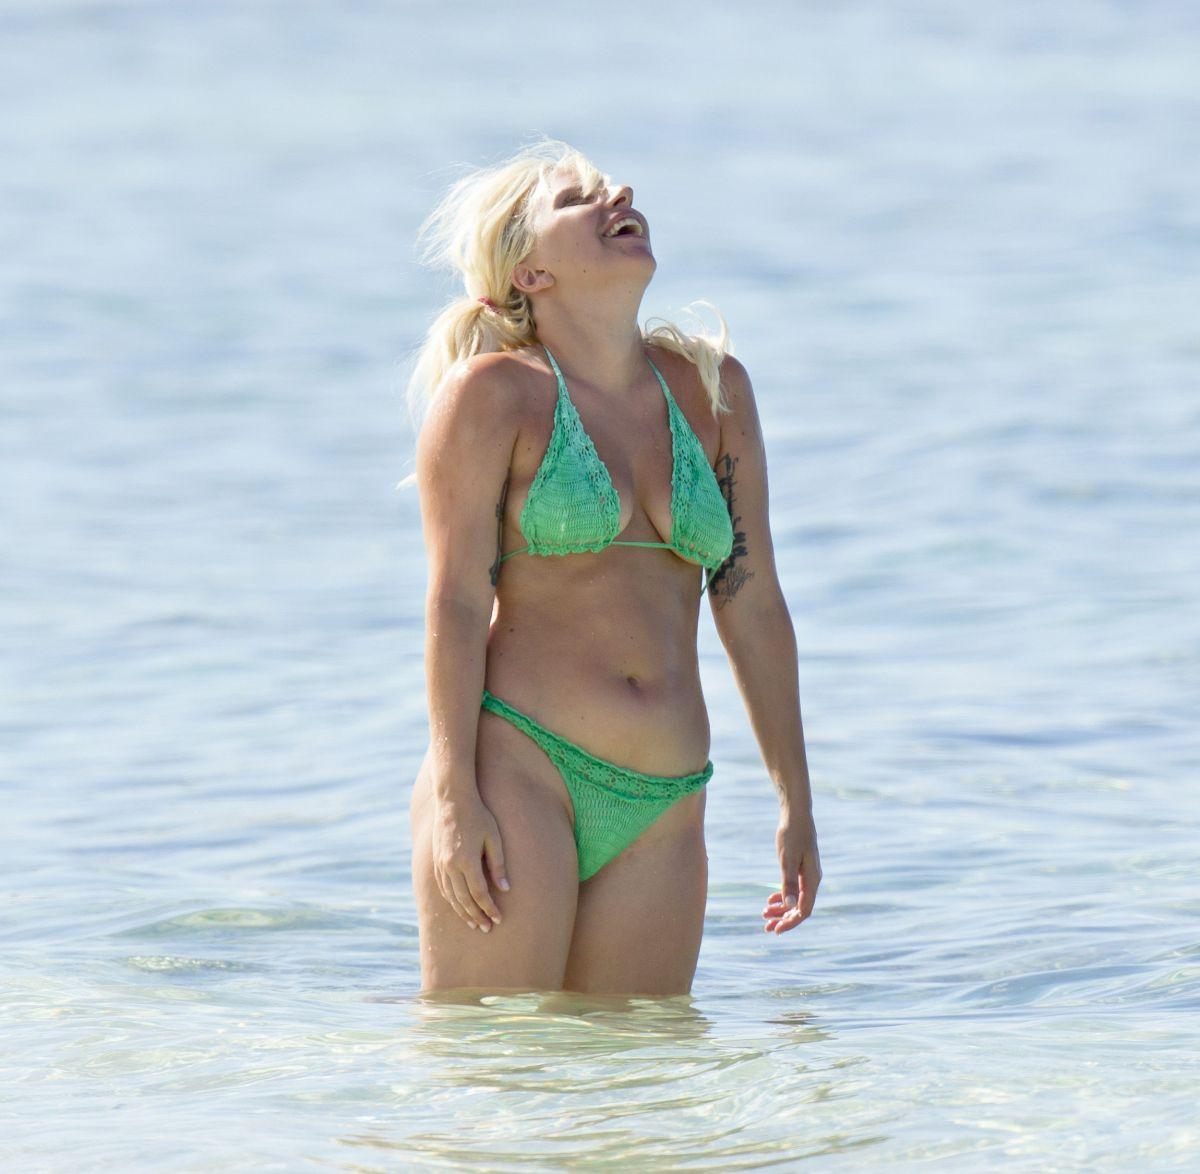 LADY GAGA in Bikini at a Beach in Bahamas 06182015